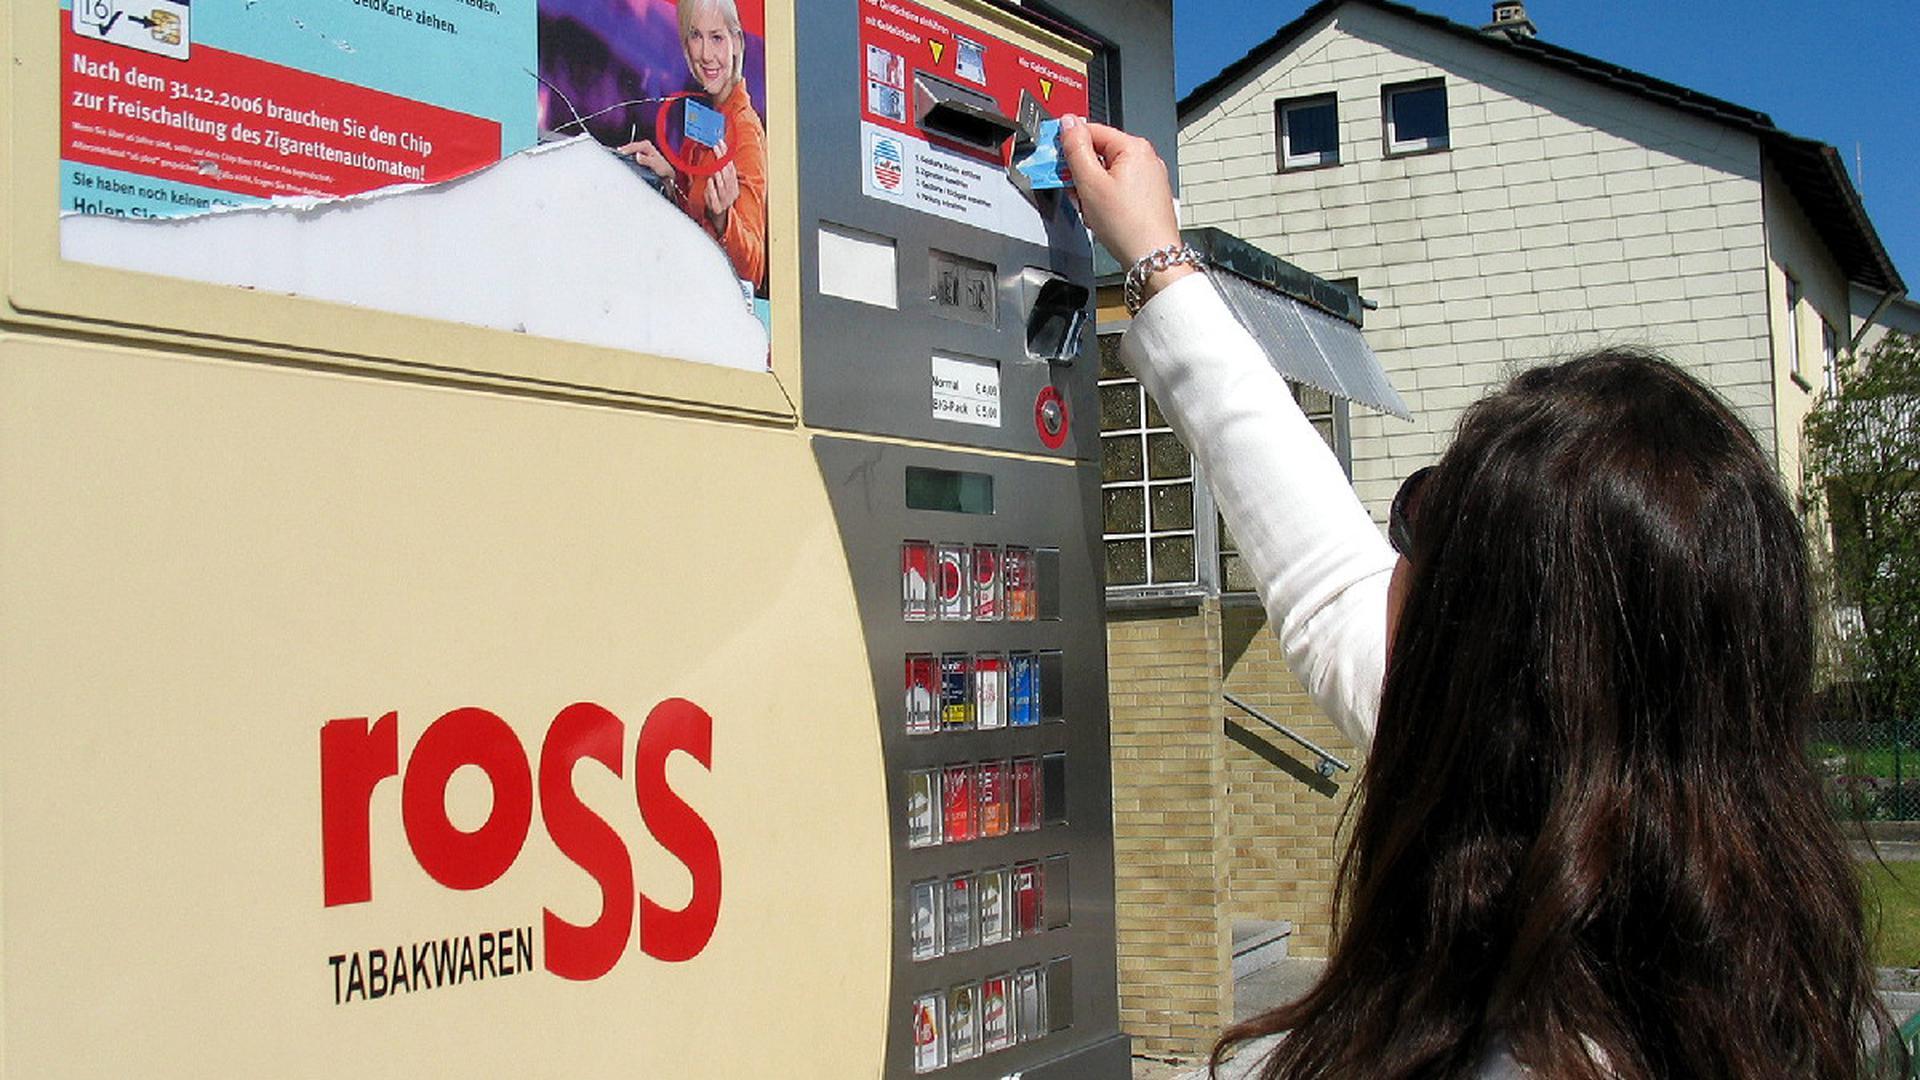 Zigaretten Tabak Zigarettenautomaten nur noch mit Karte